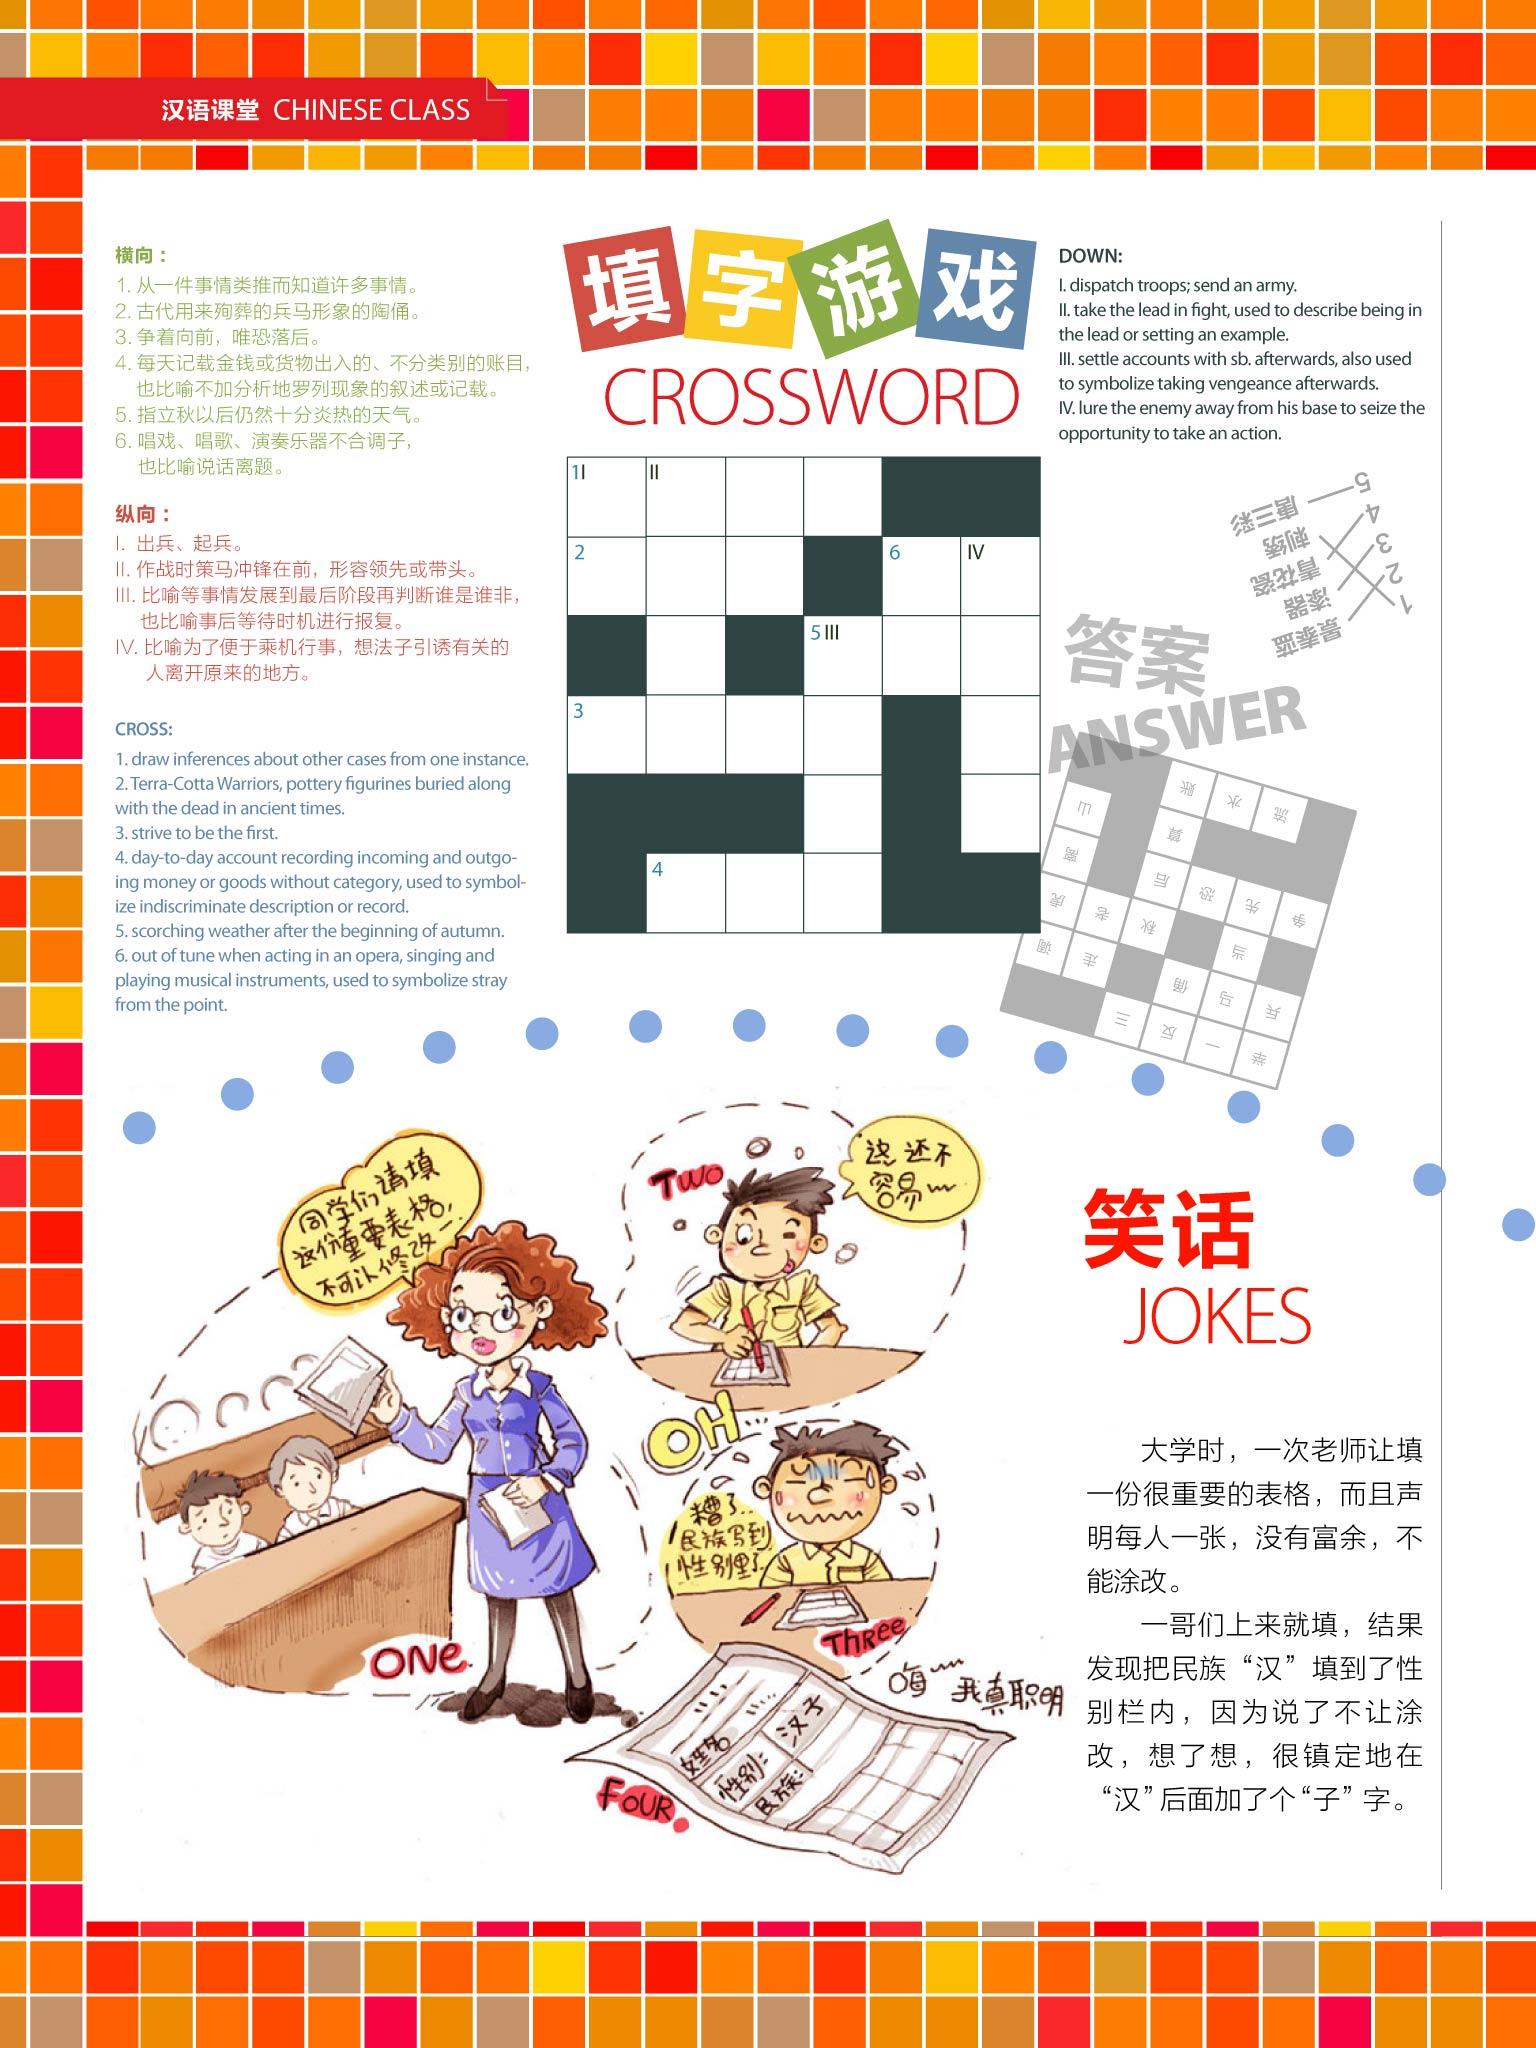 Chinese class 20